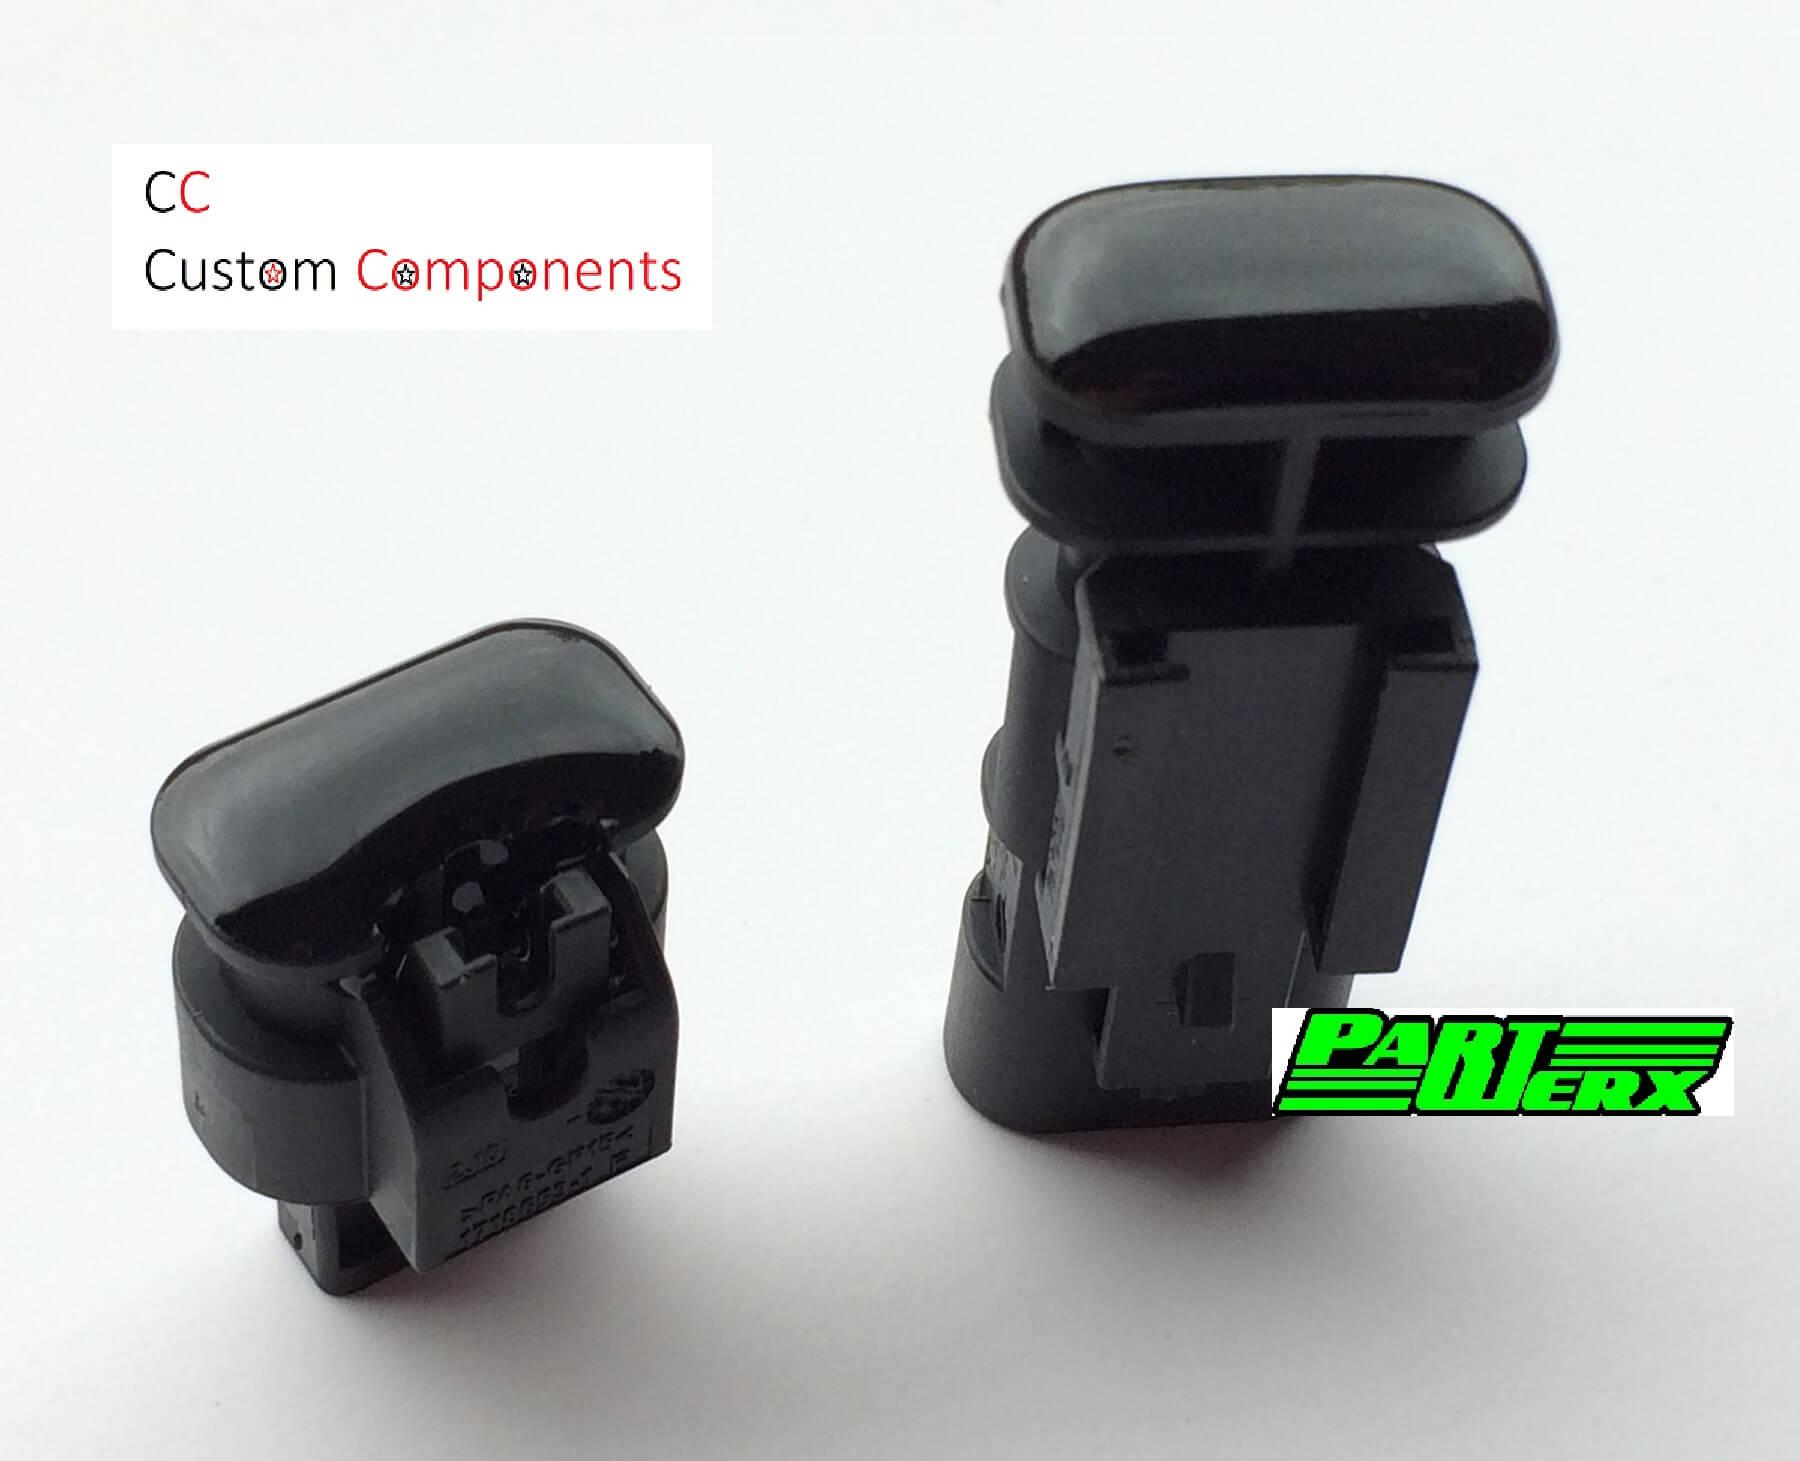 Exhaust Valve Wiring Loom Terminator & Blanking Plug Protector